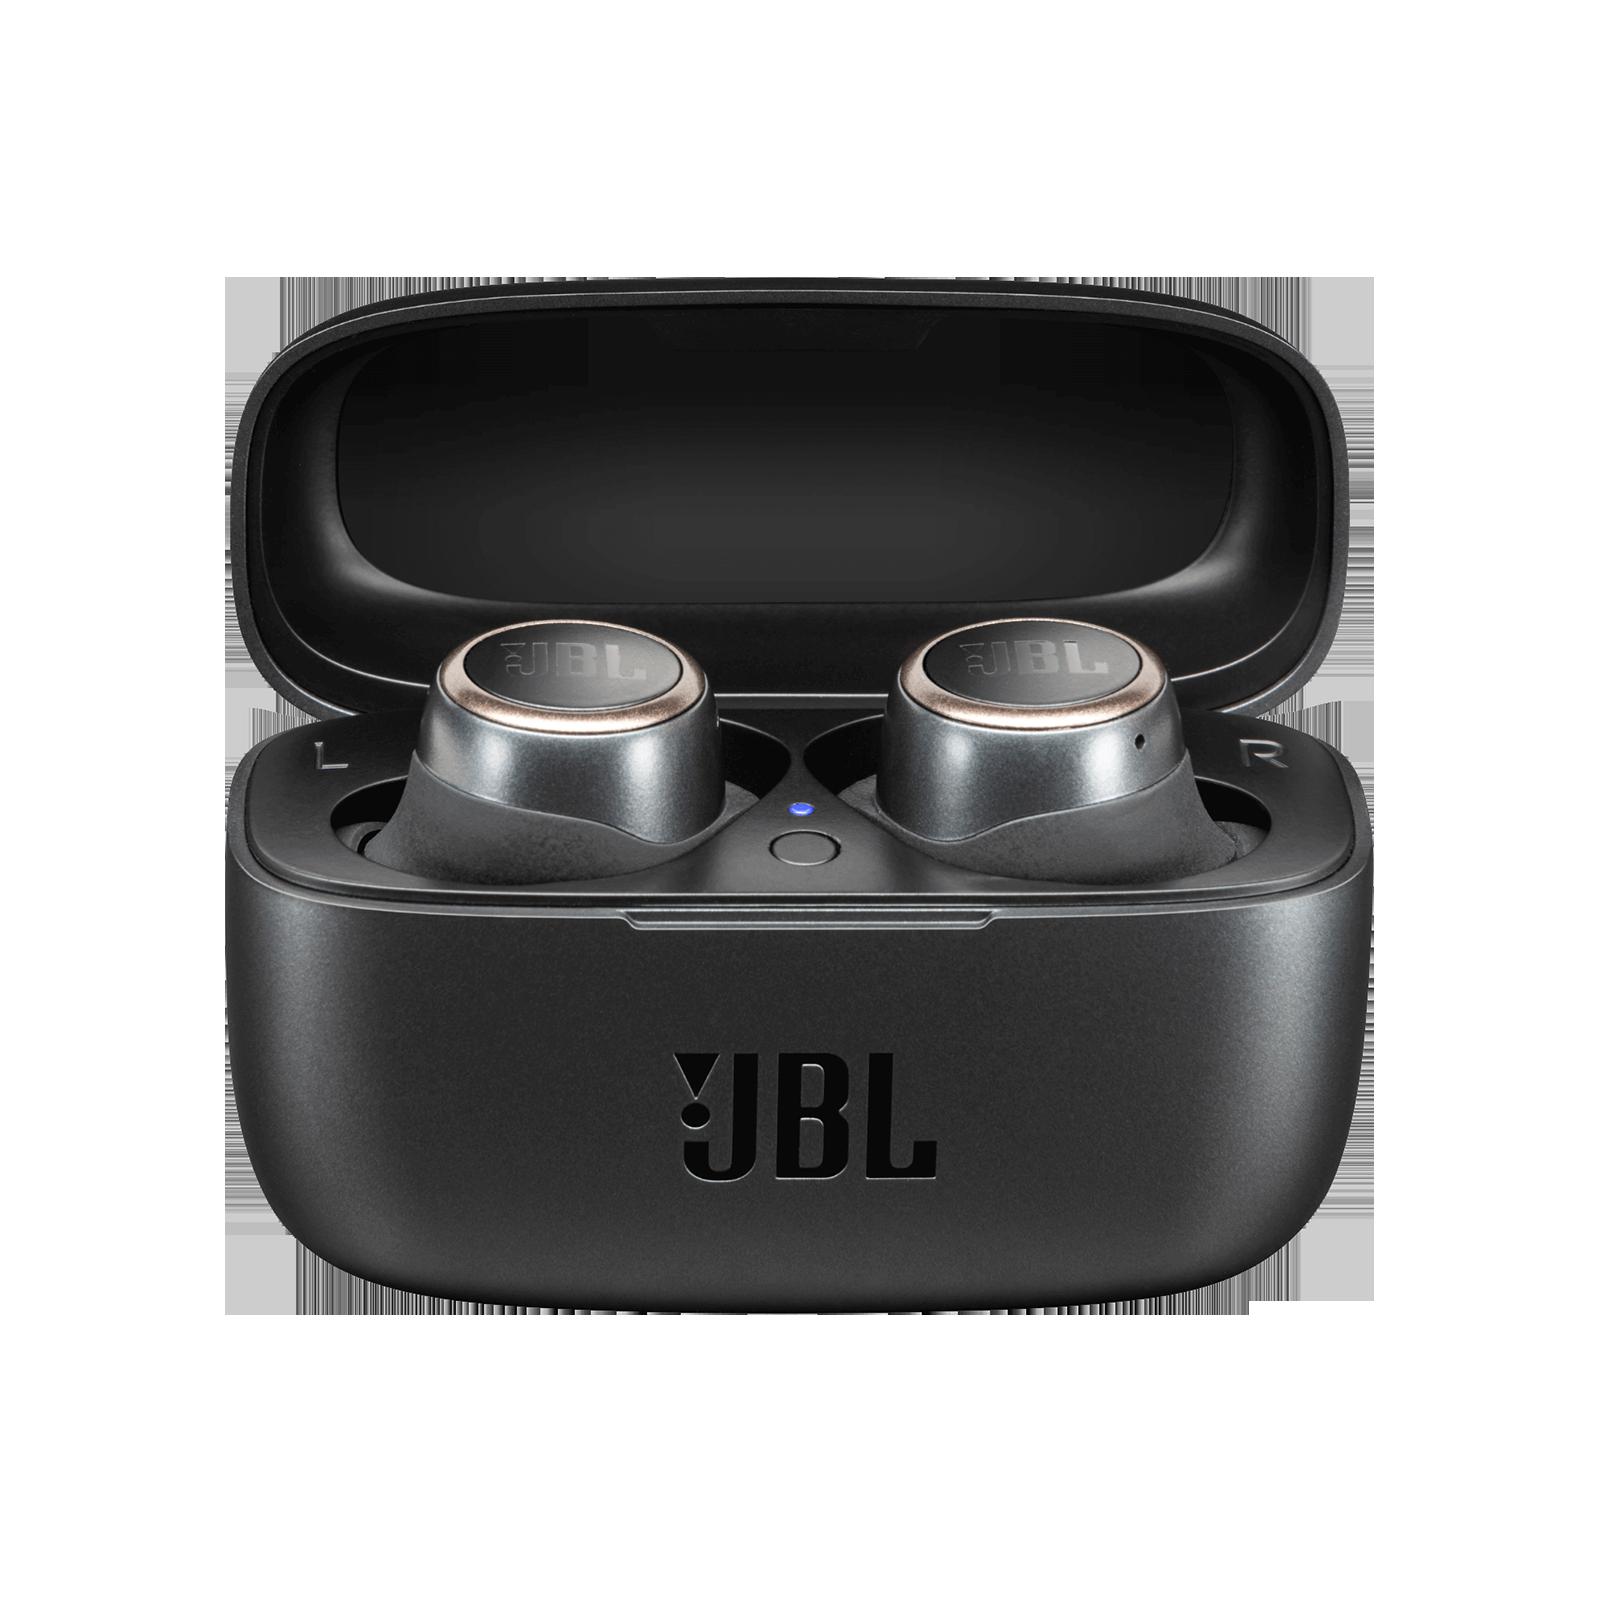 Jbl Live 300tws True Wireless In Ear Headphones With Smart Ambient